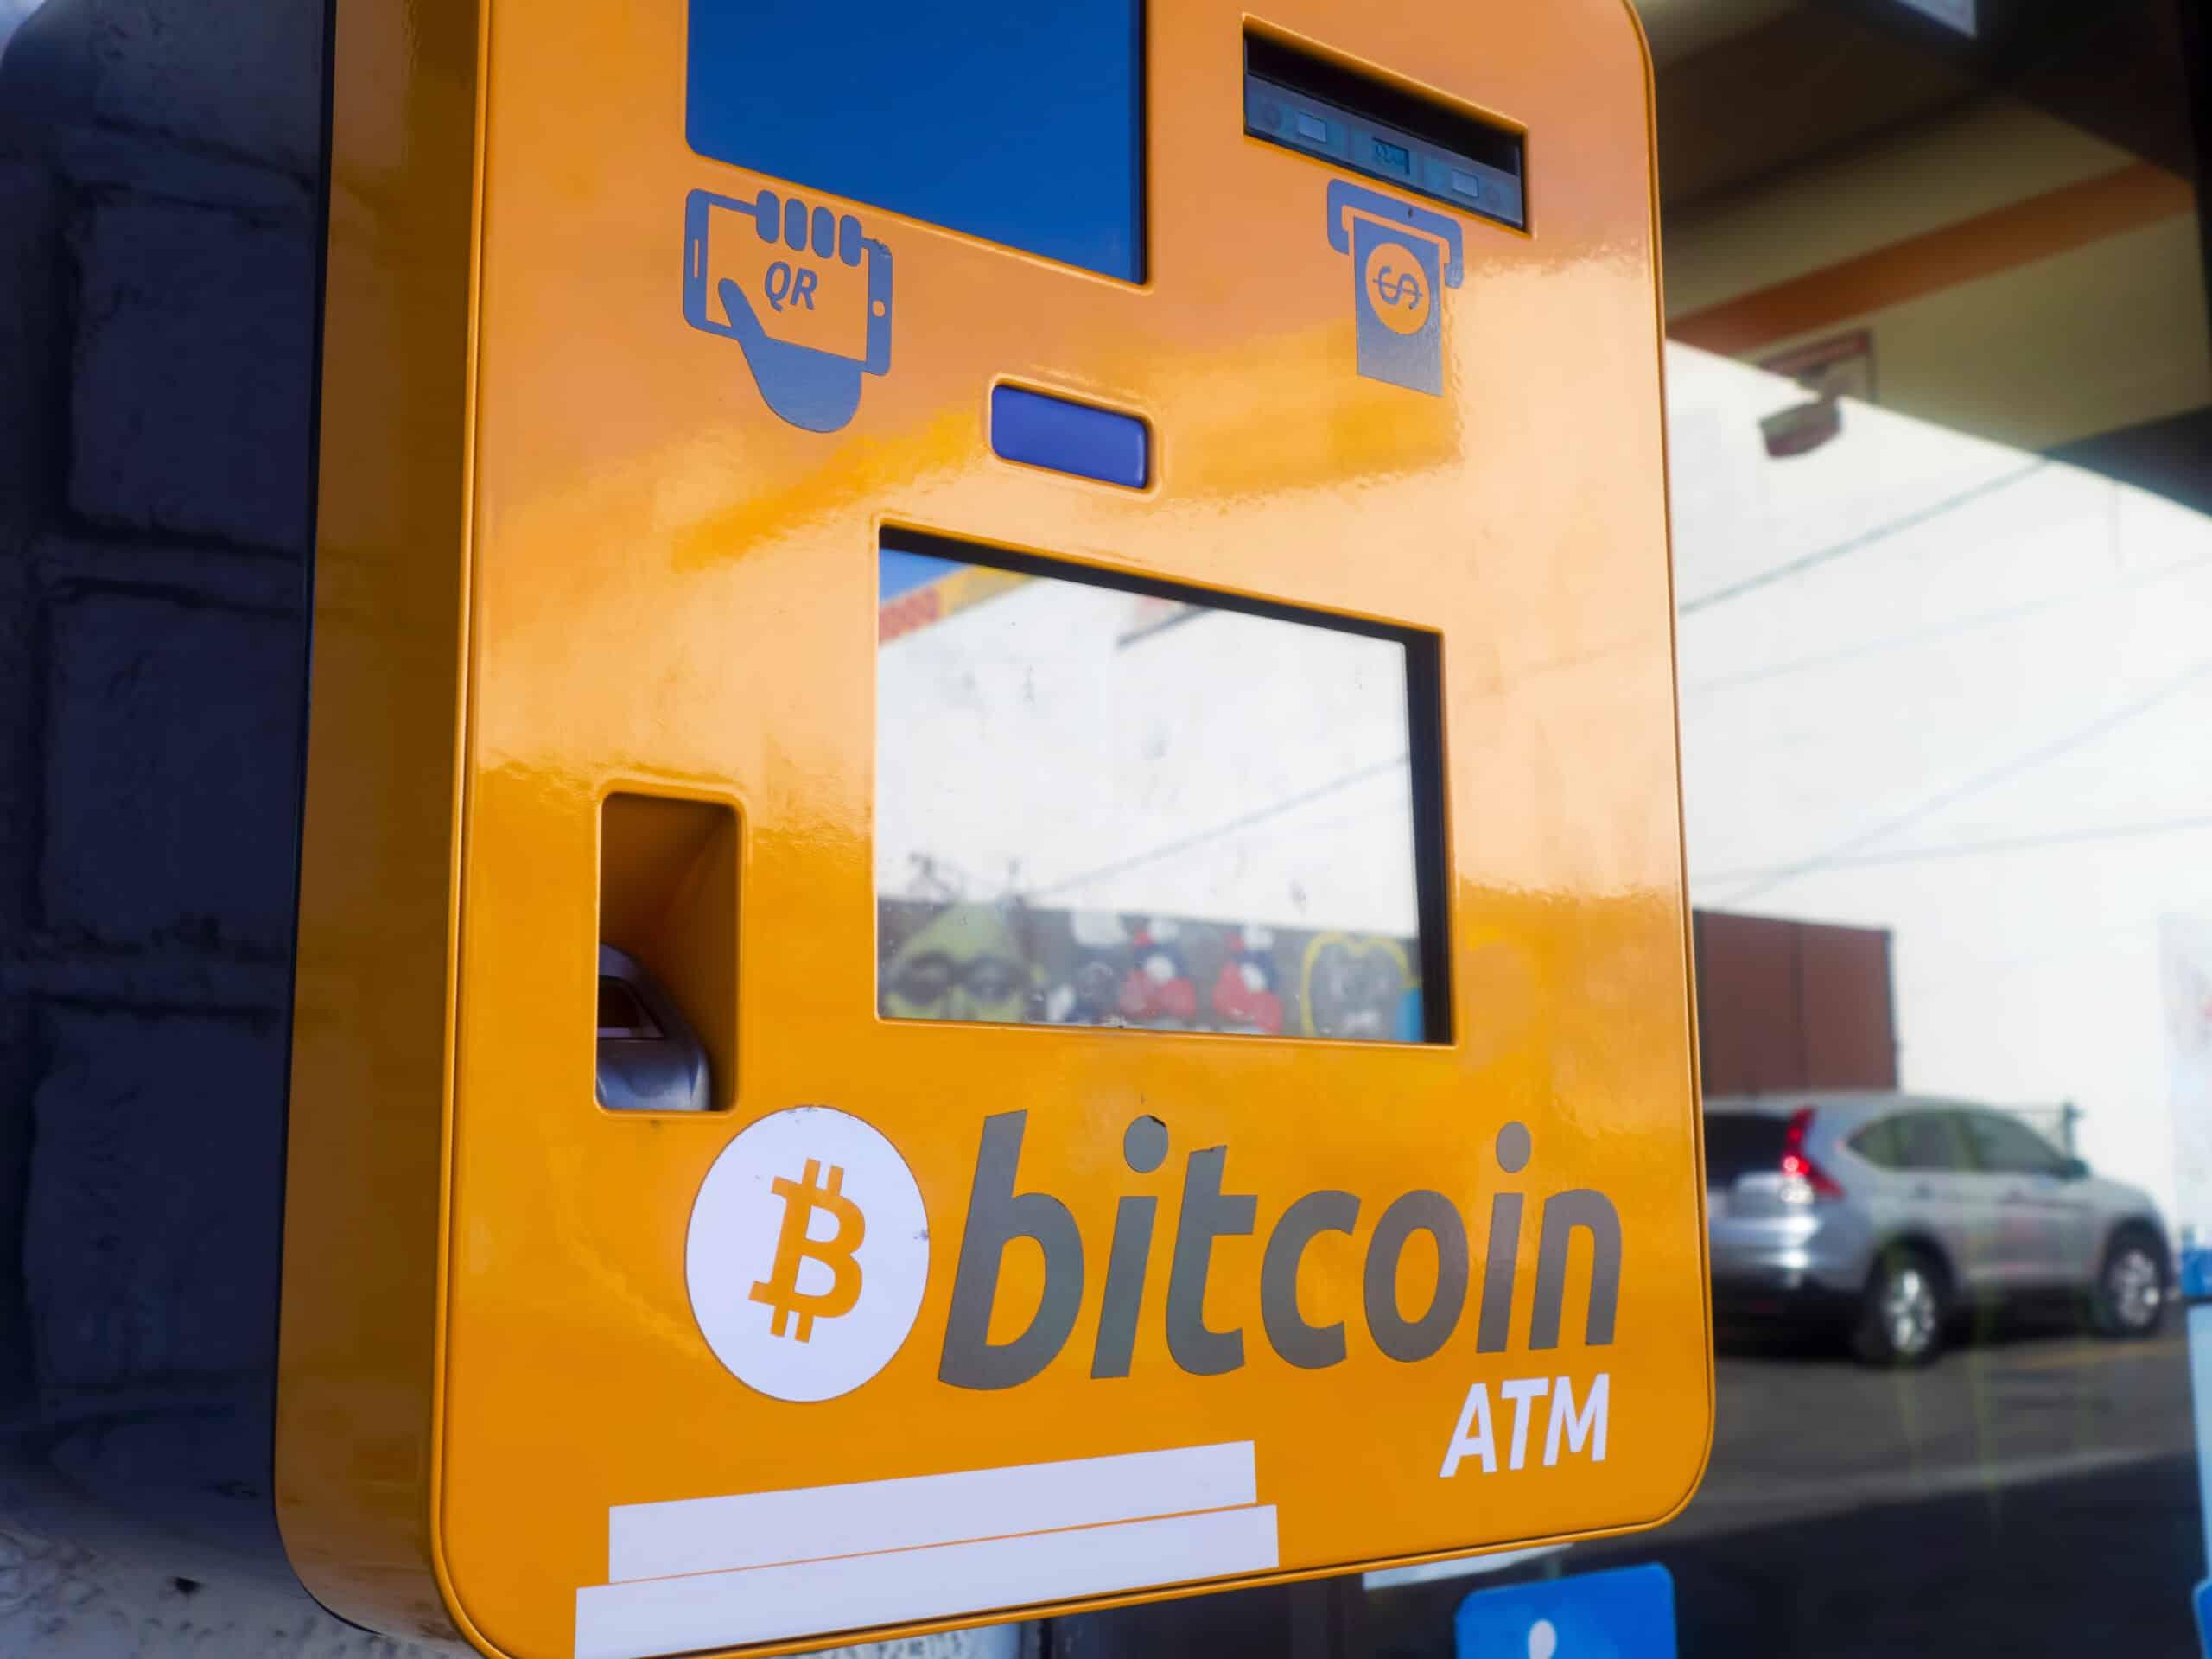 Bitcoin ATM Automat